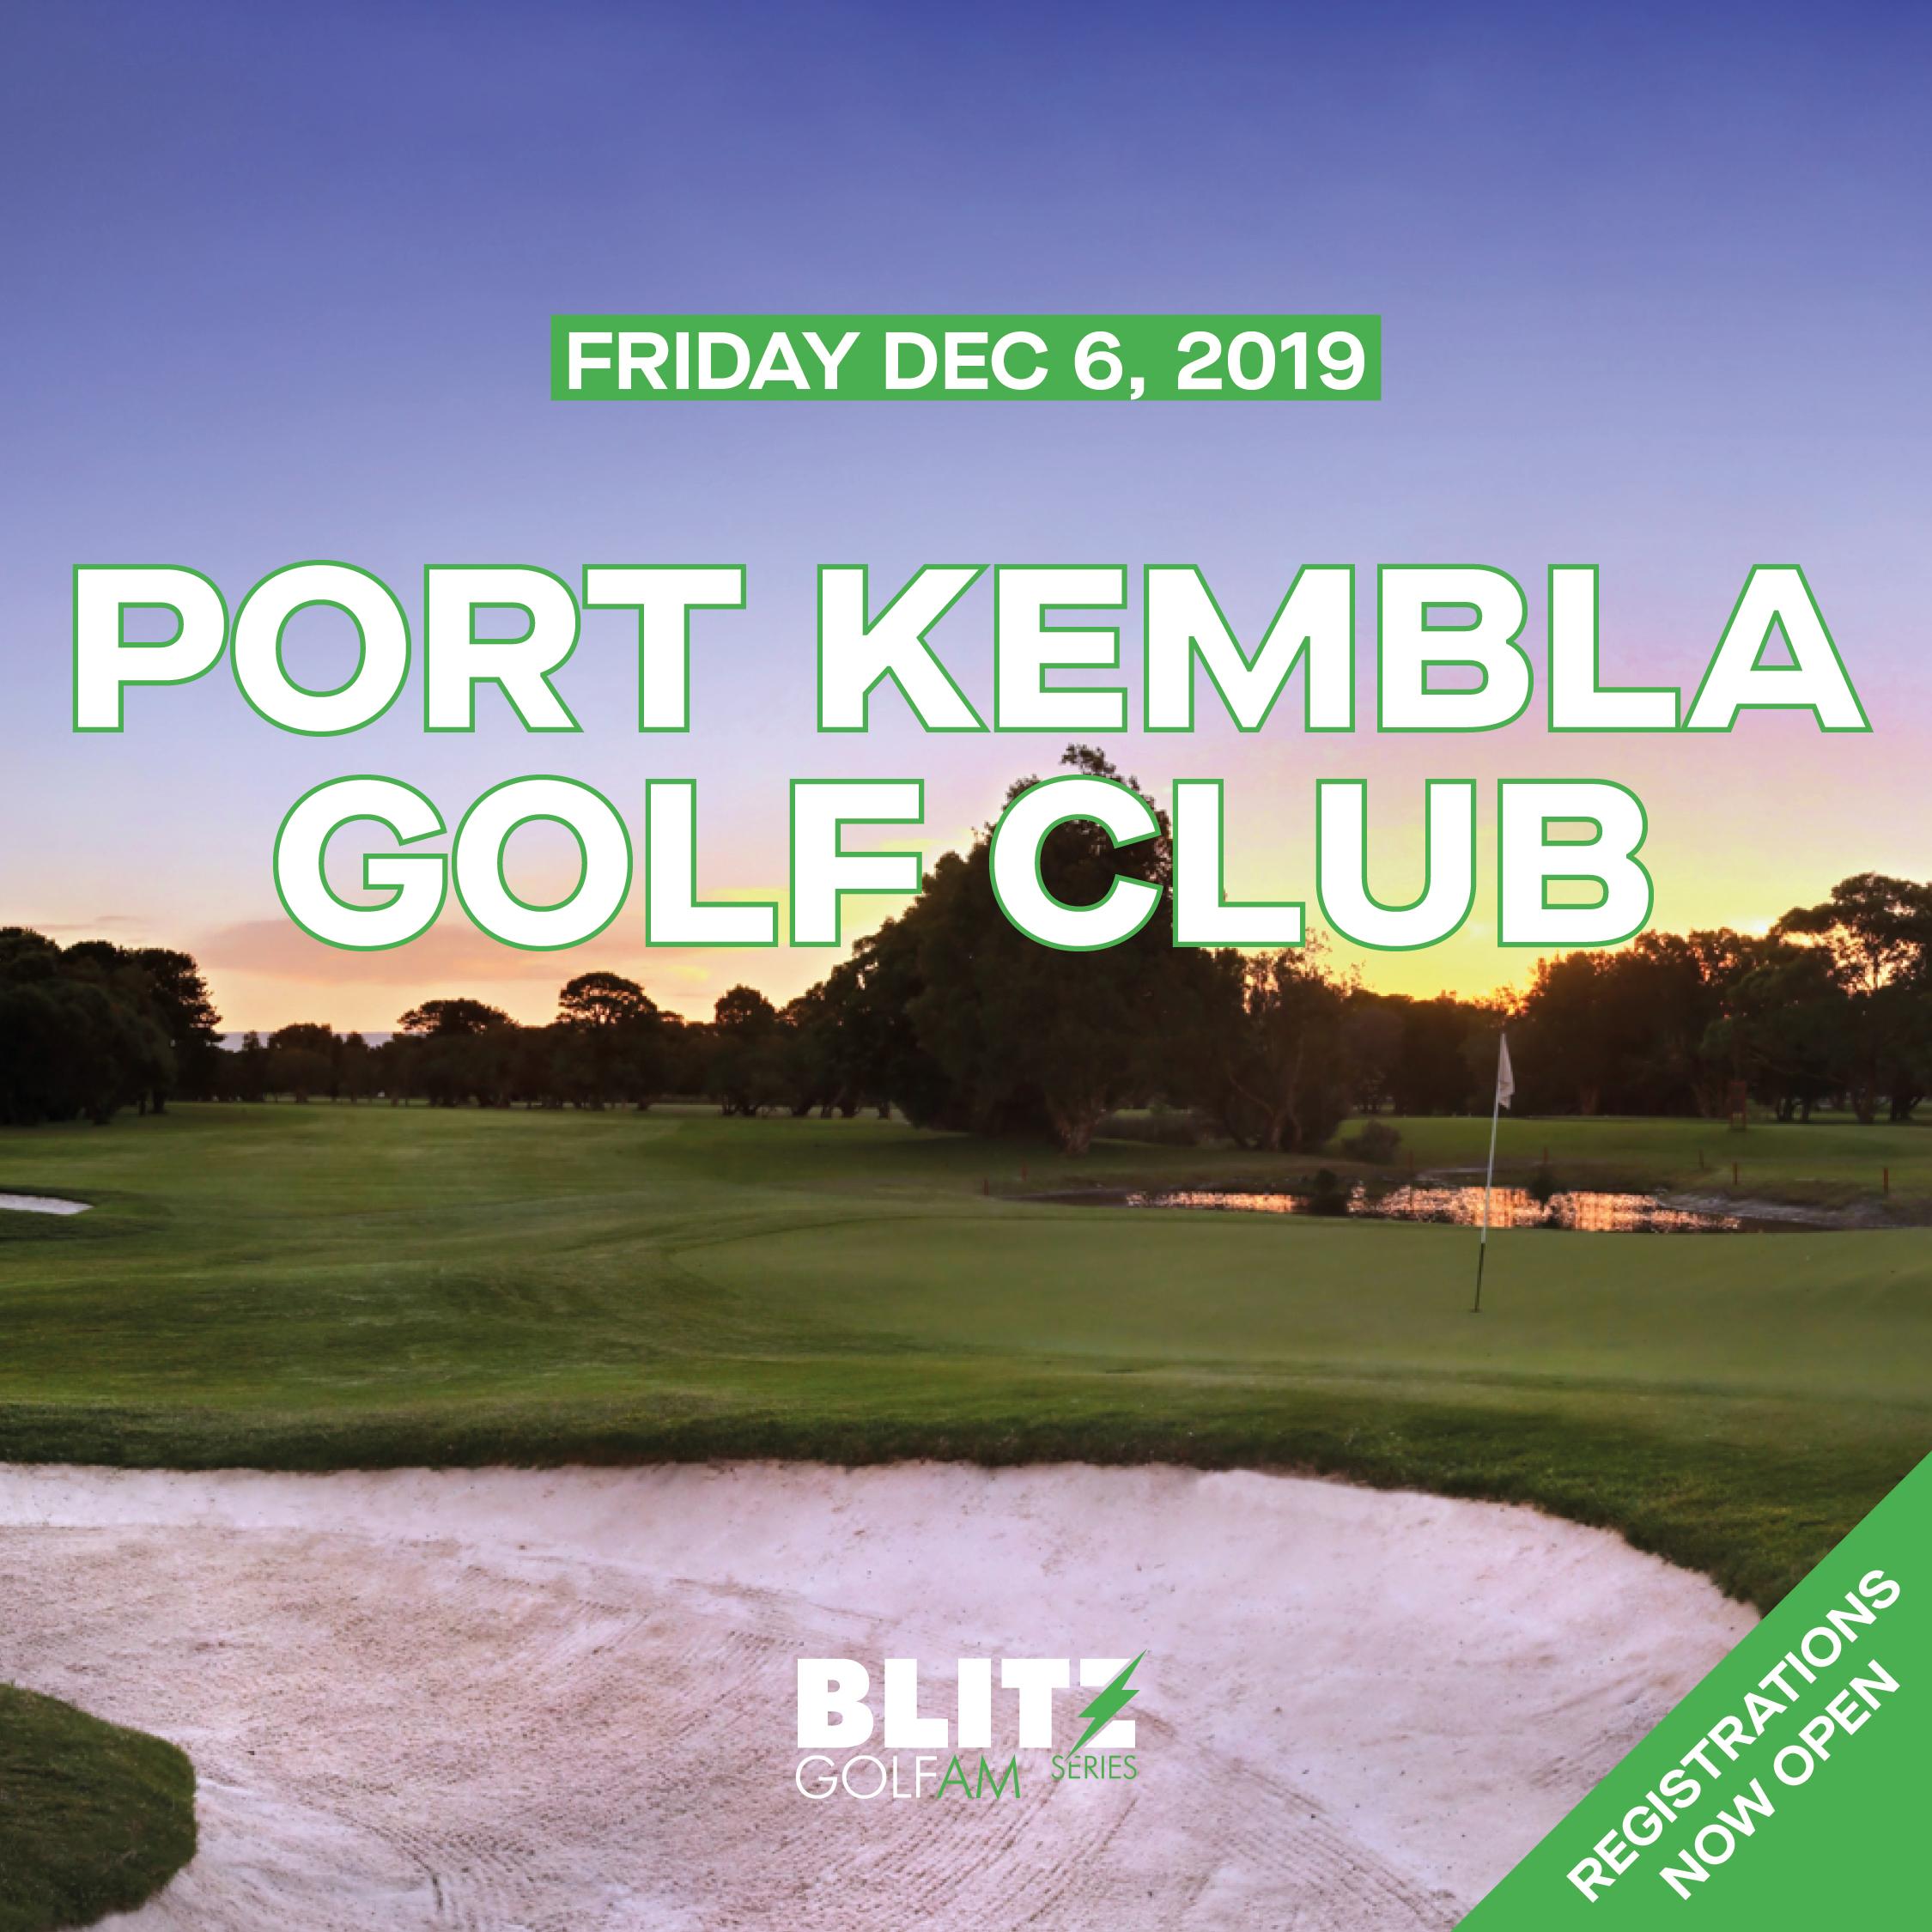 NSWACT_Port Kembla_Blitz 2020_AM Series Launch_061219.jpg